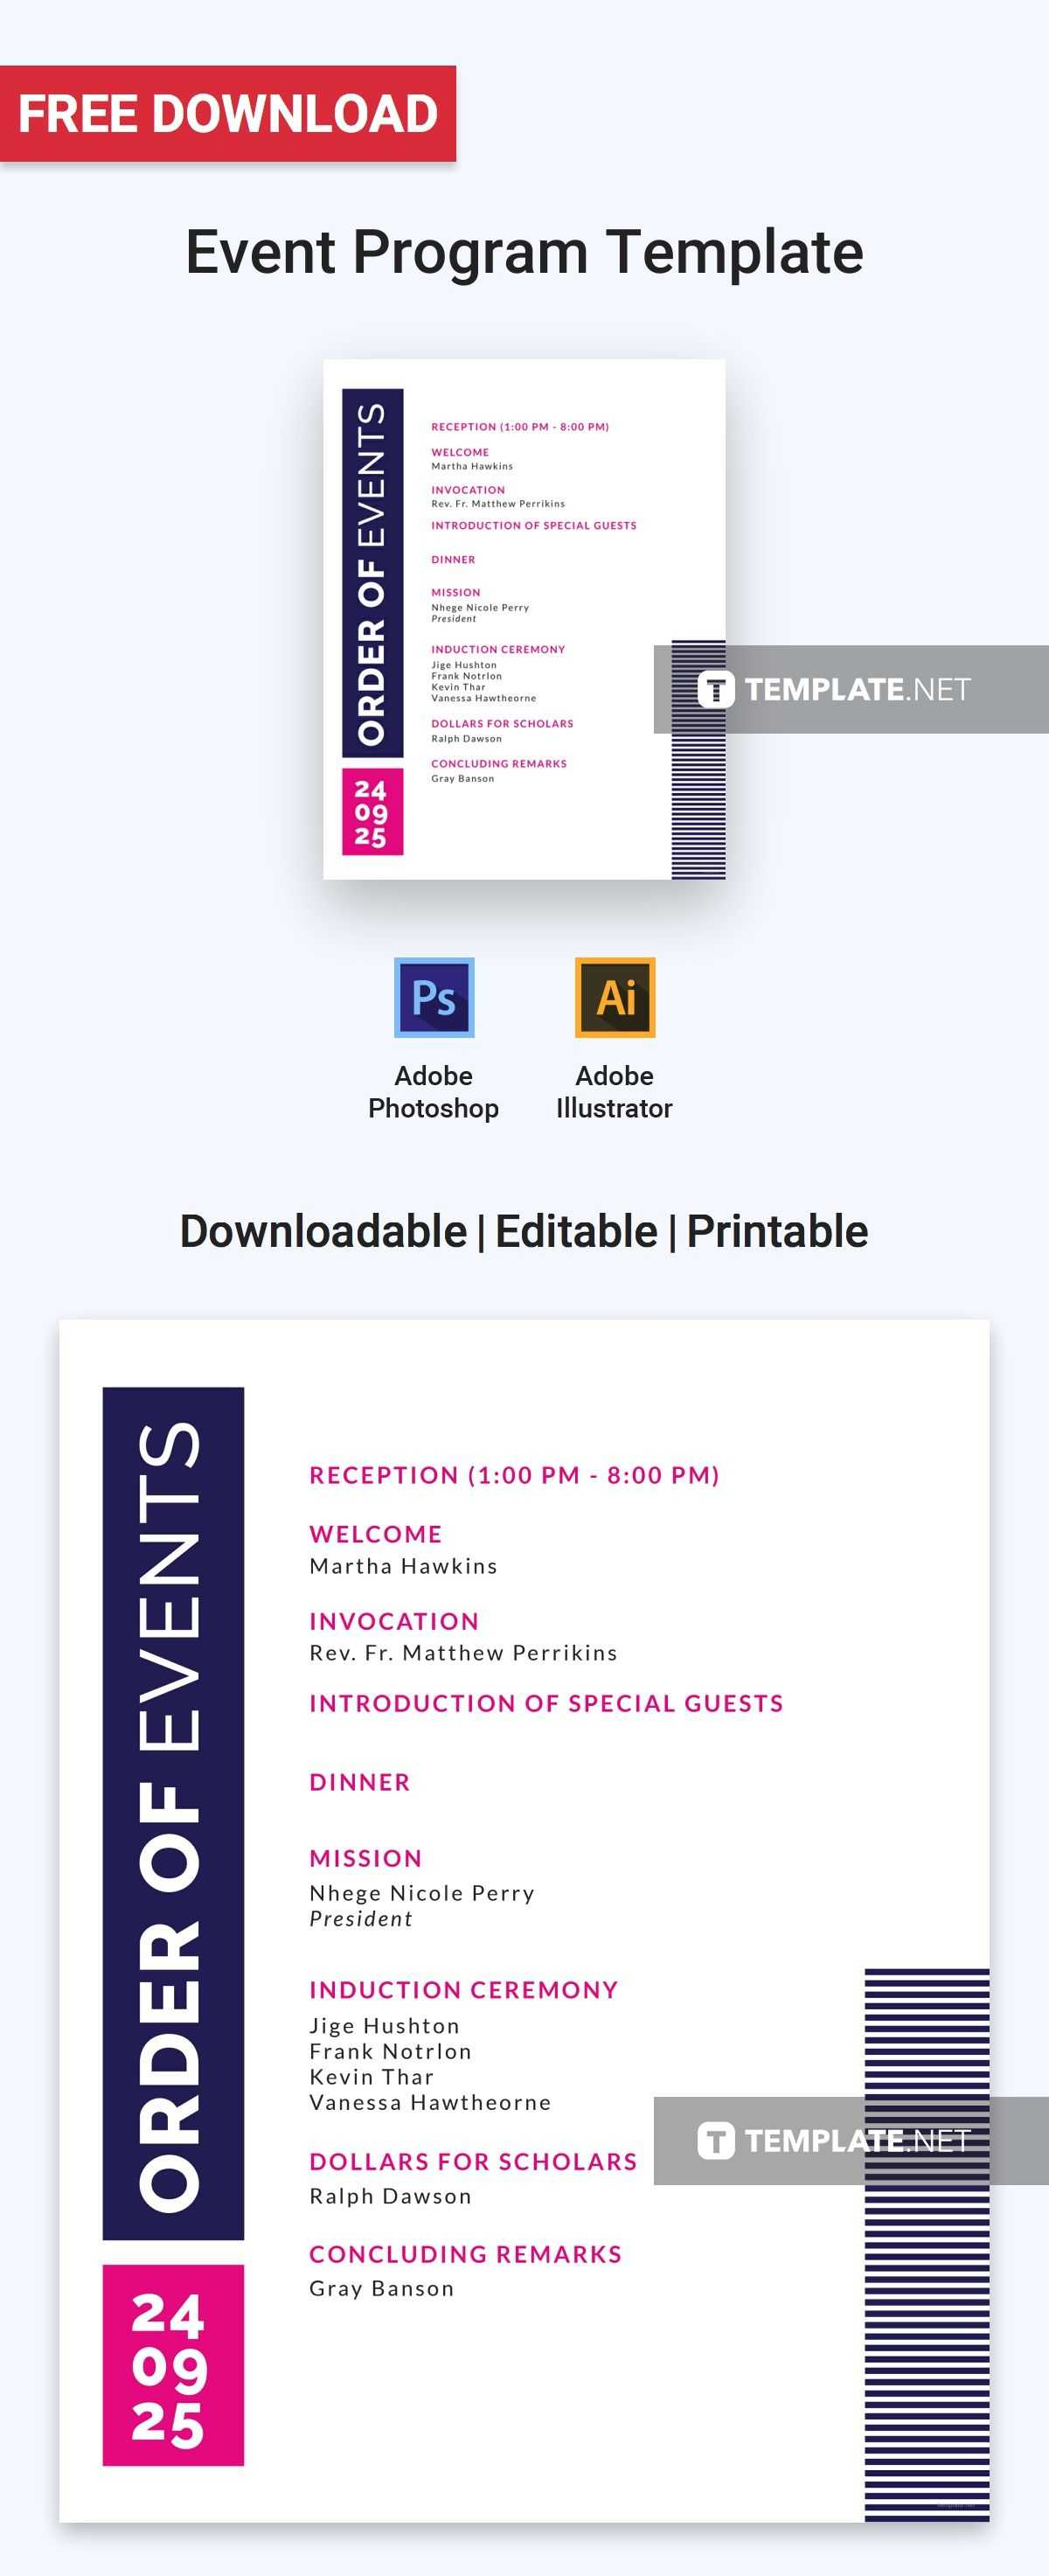 Free Event Program Invitation | Program Templates & Designs Intended For Free Event Program Templates Word